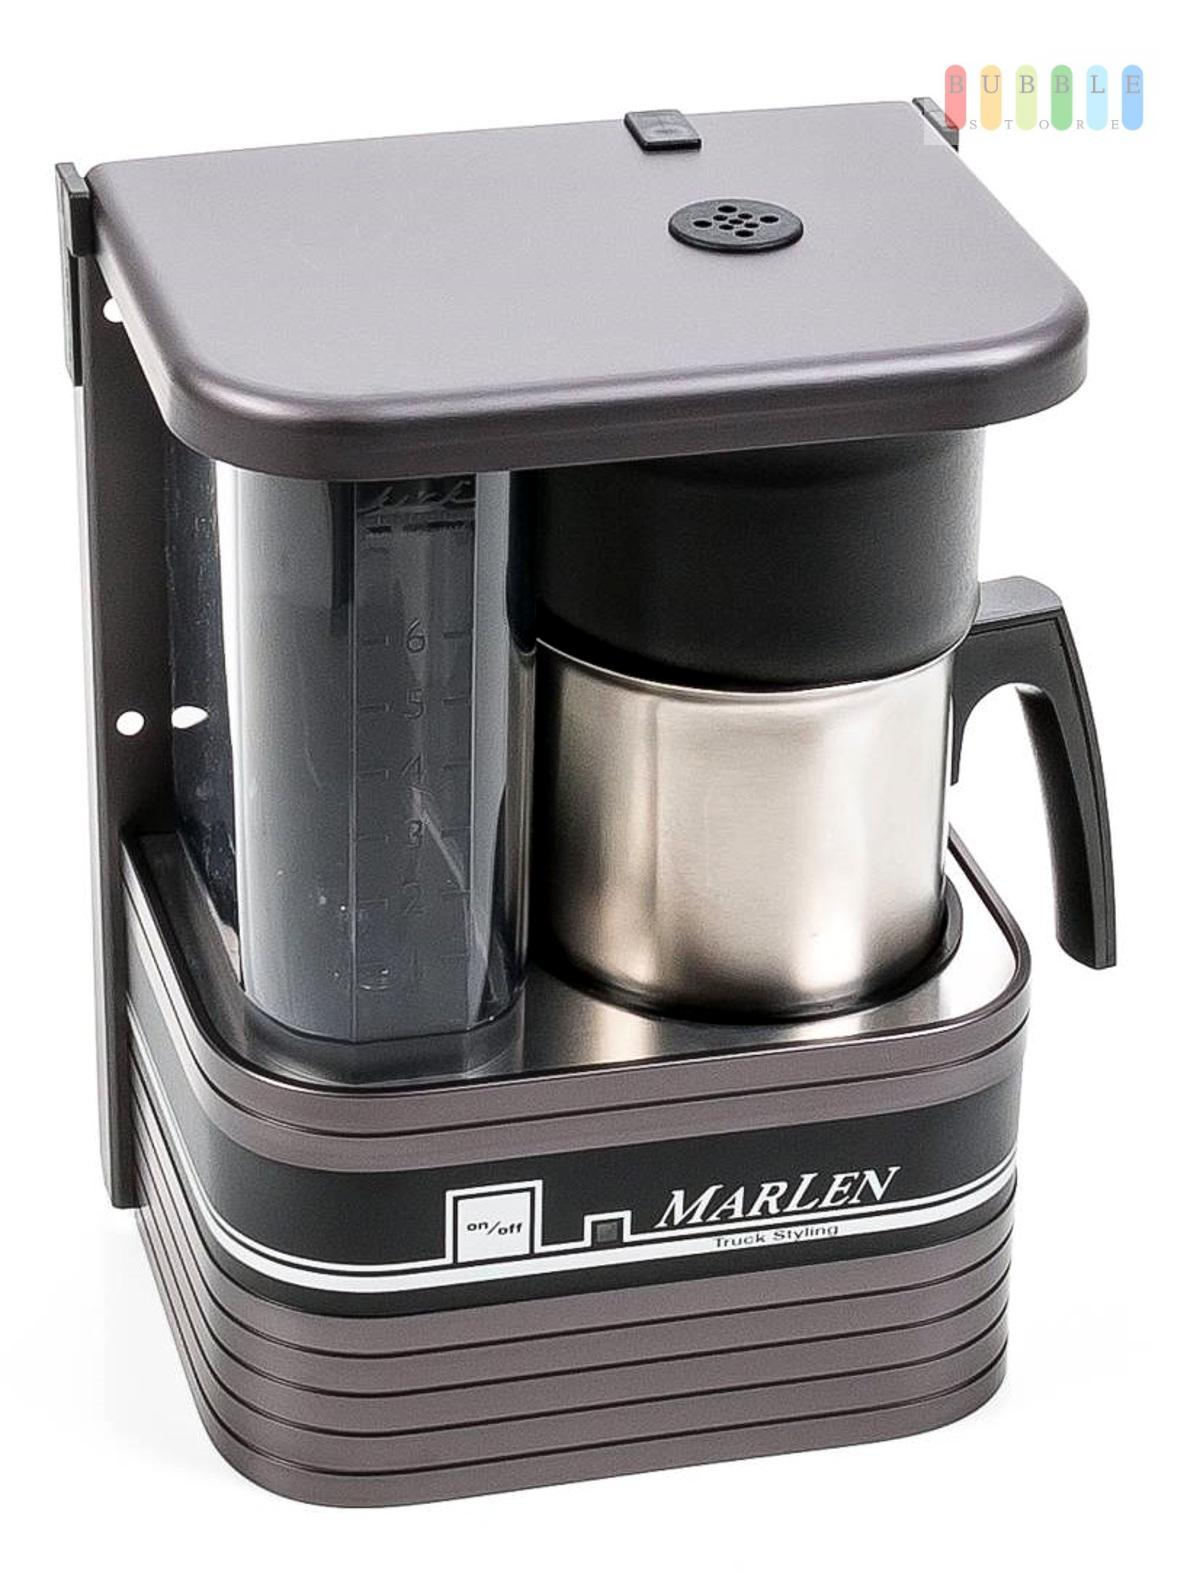 marlen kirk kaffeemaschine 6 tassen kaffee lkw truck. Black Bedroom Furniture Sets. Home Design Ideas